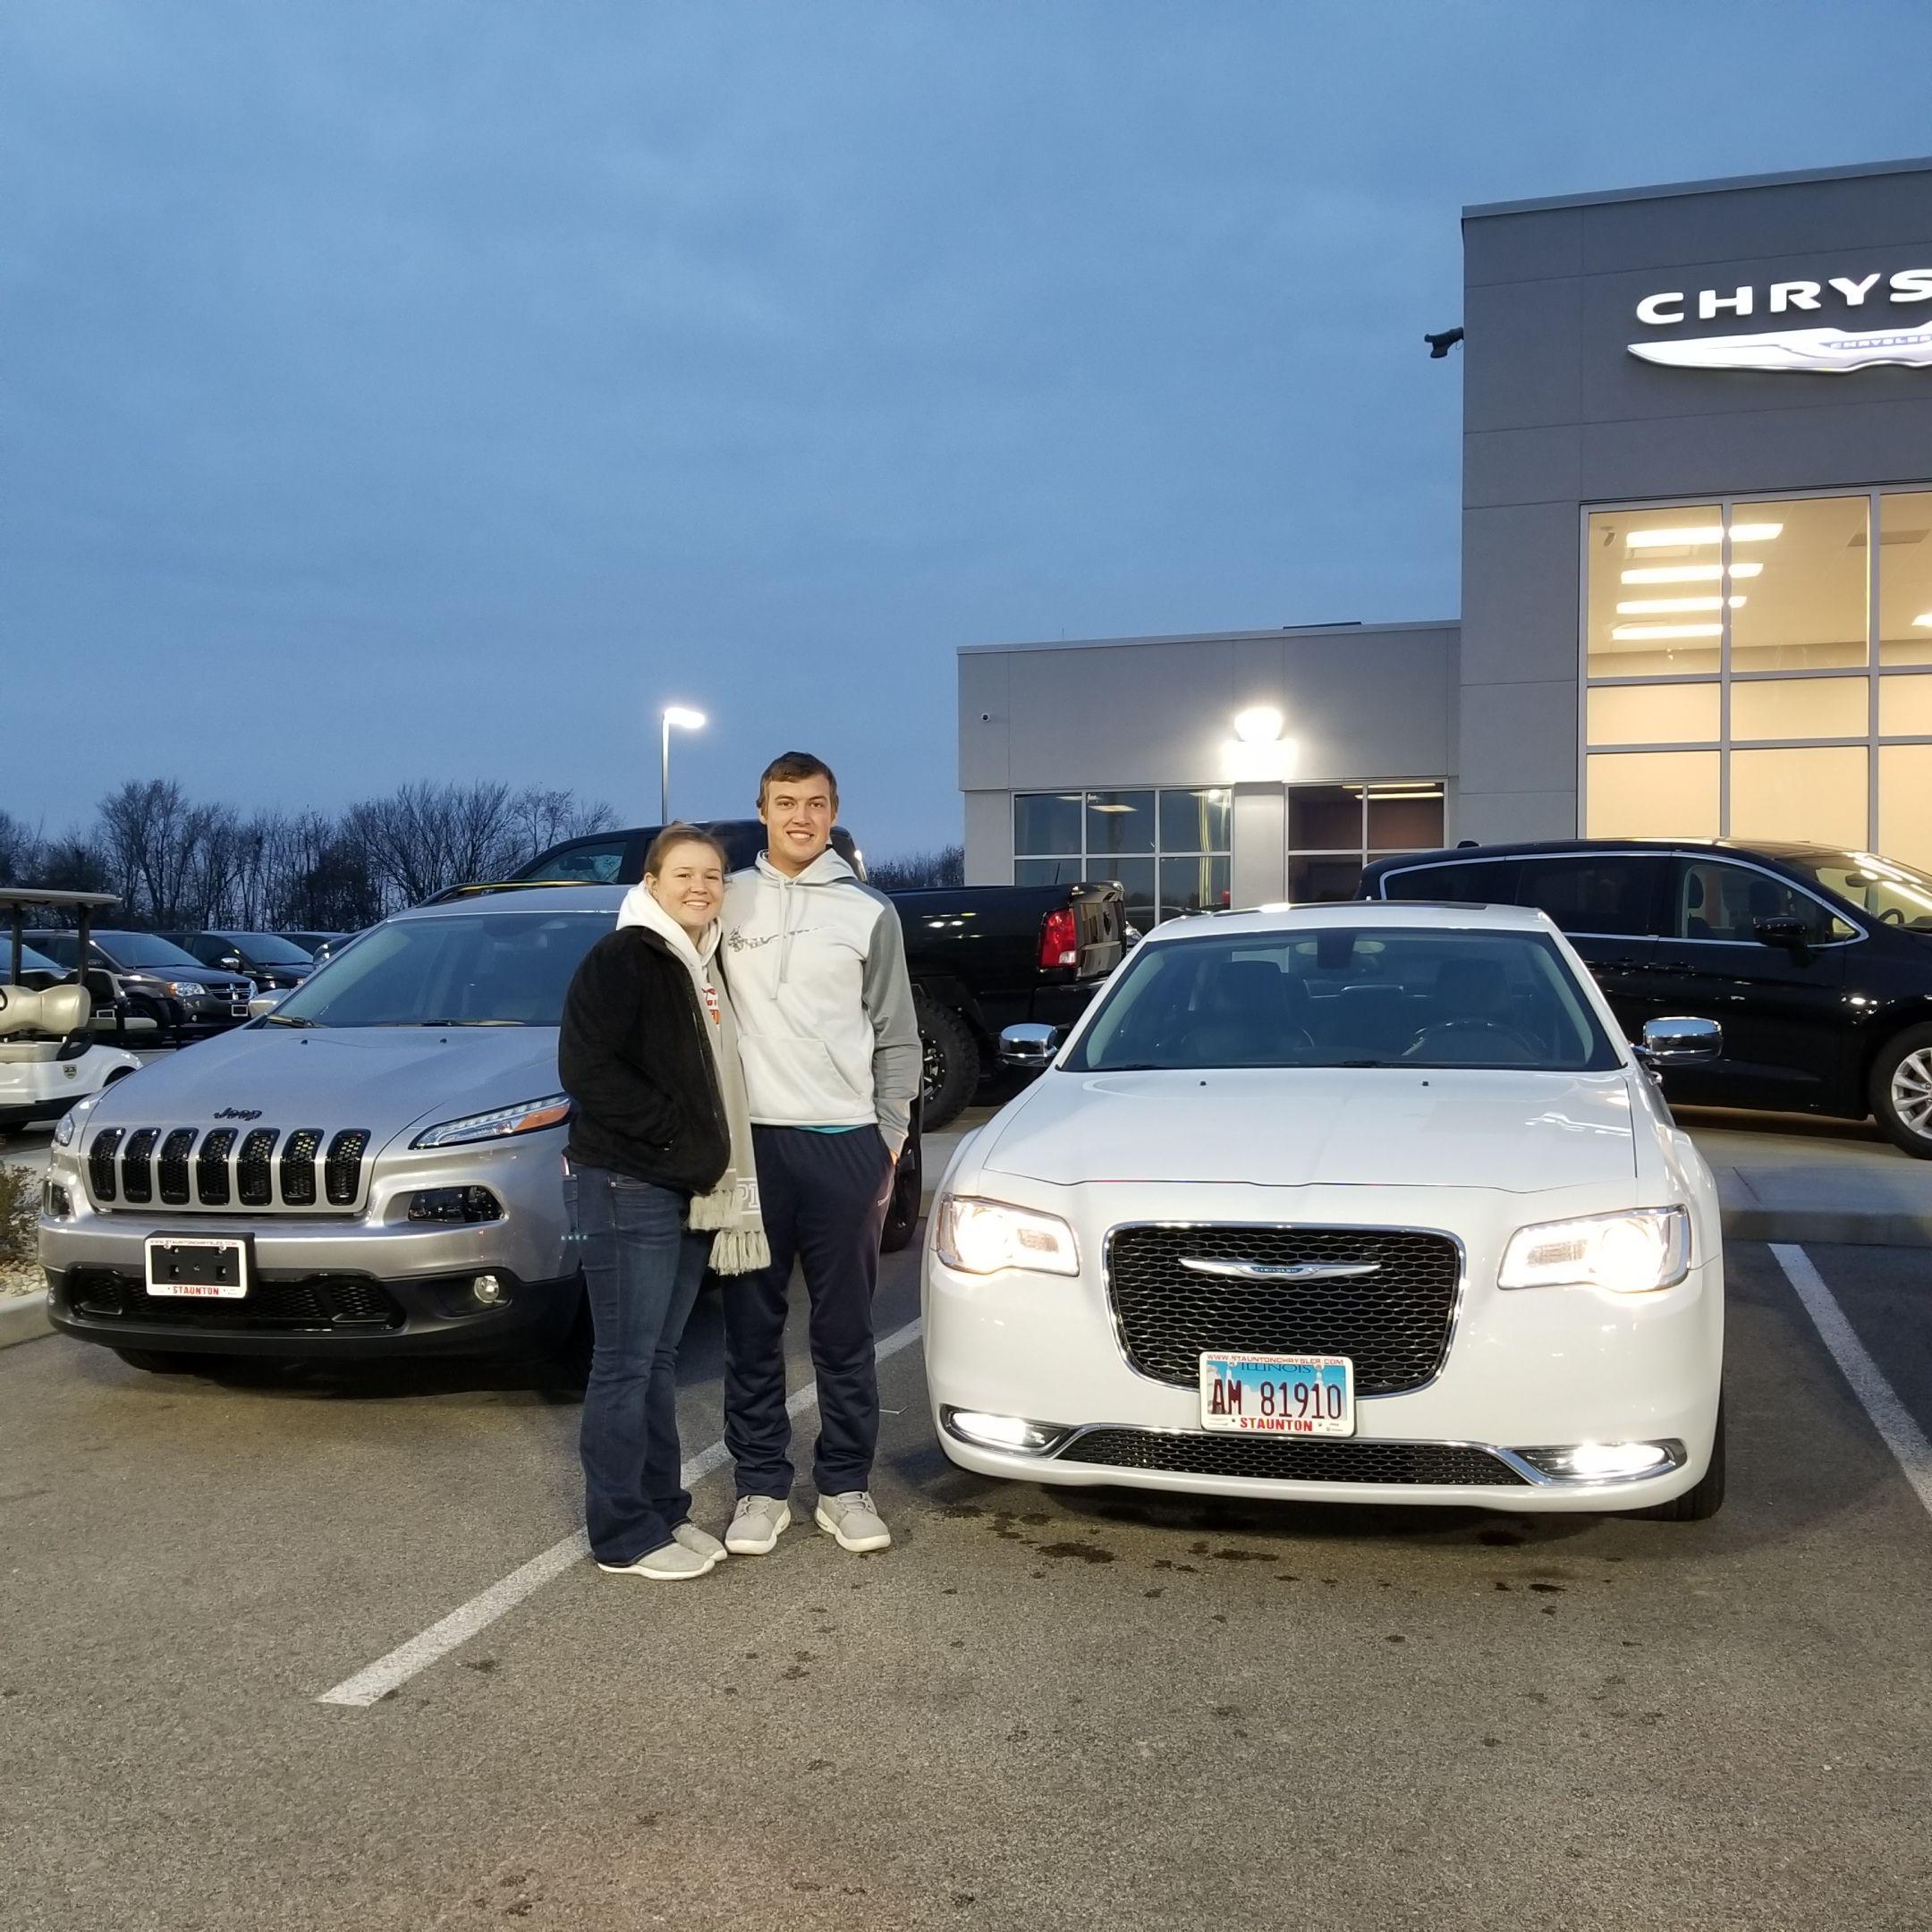 bob ram new lineup jeep dodge dealership htm columbus chrysler boyd ohio